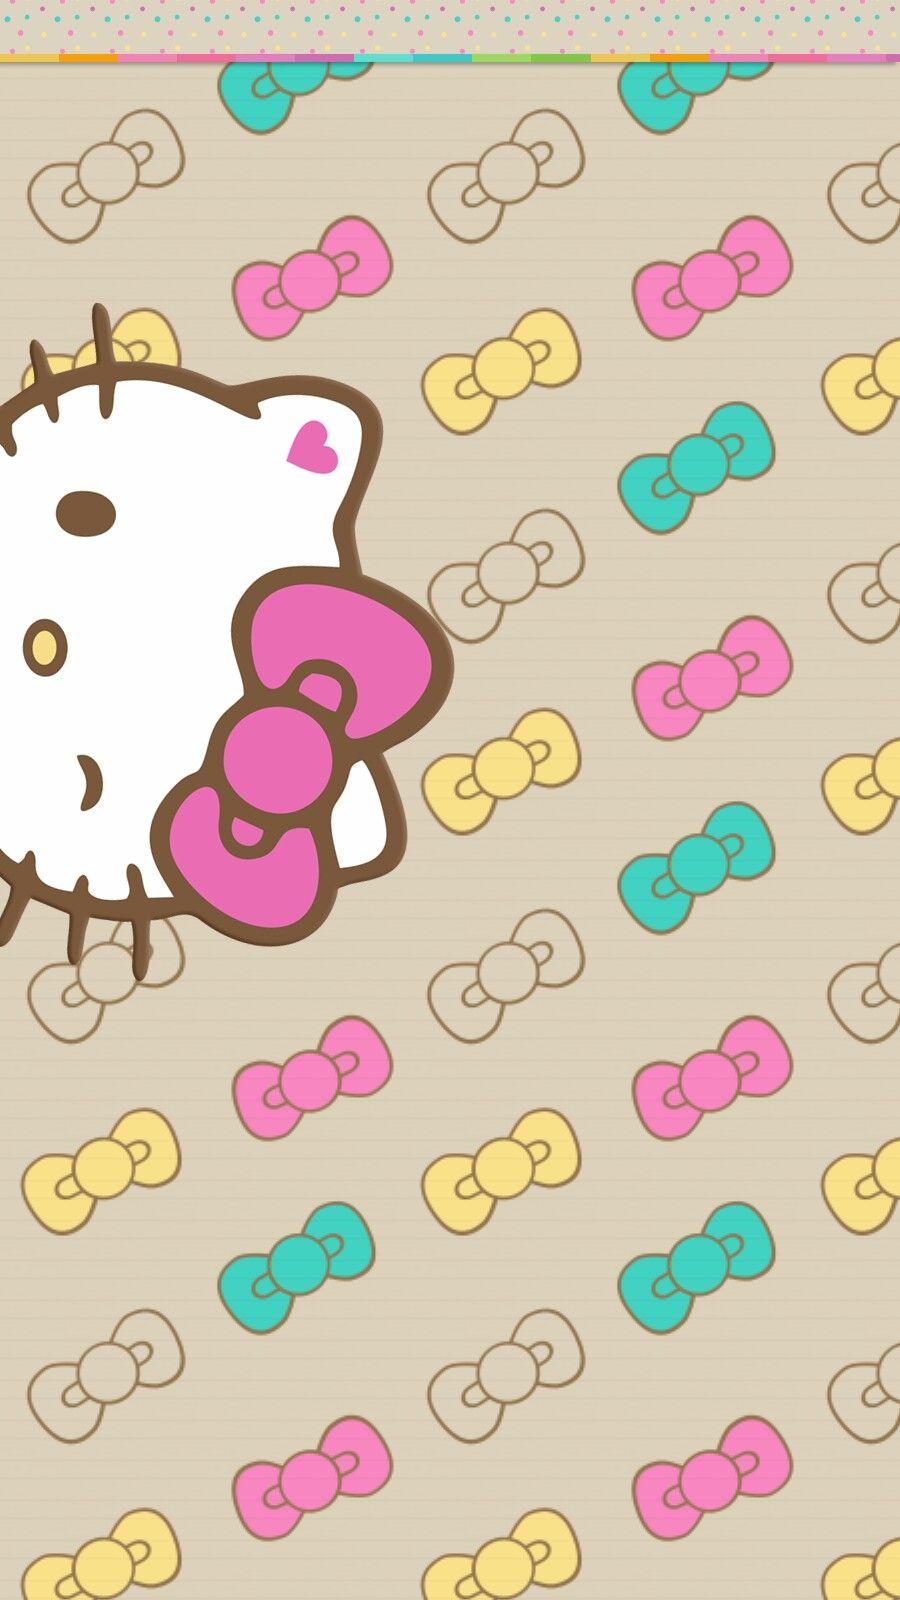 Download Wallpaper Hello Kitty Wall - ca0749bfbc686ffac61000a7fbcd04eb  Snapshot_869573.jpg